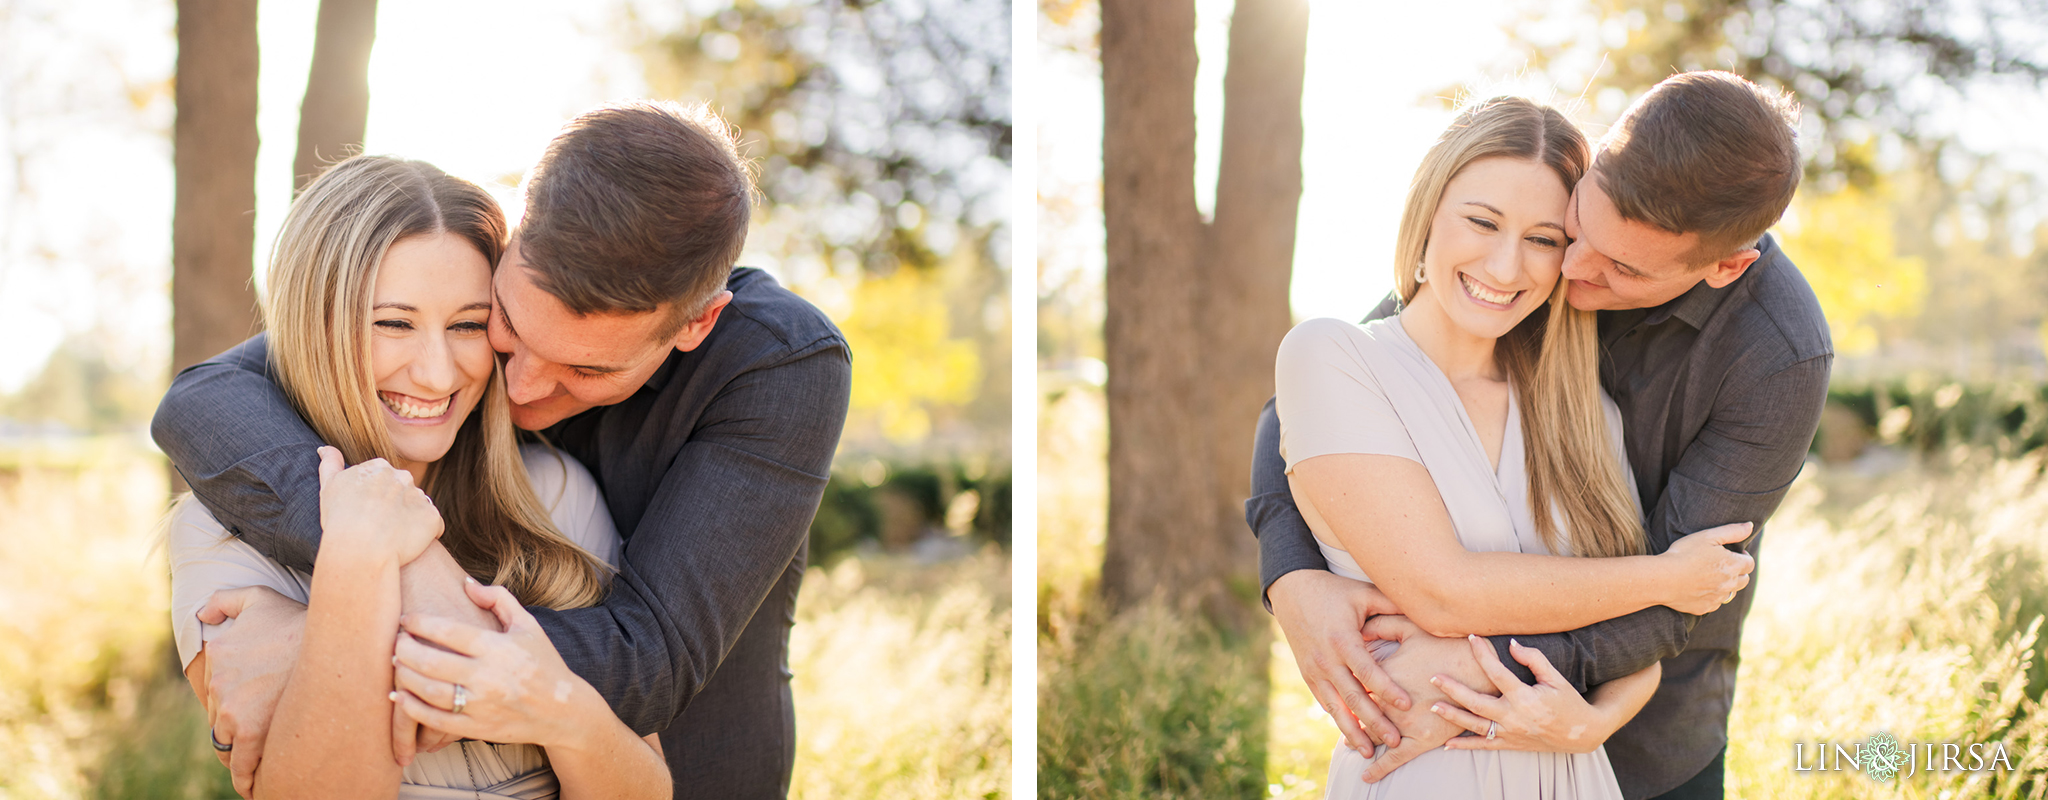 02 Cedar Grove Park Orange County Engagement Photography